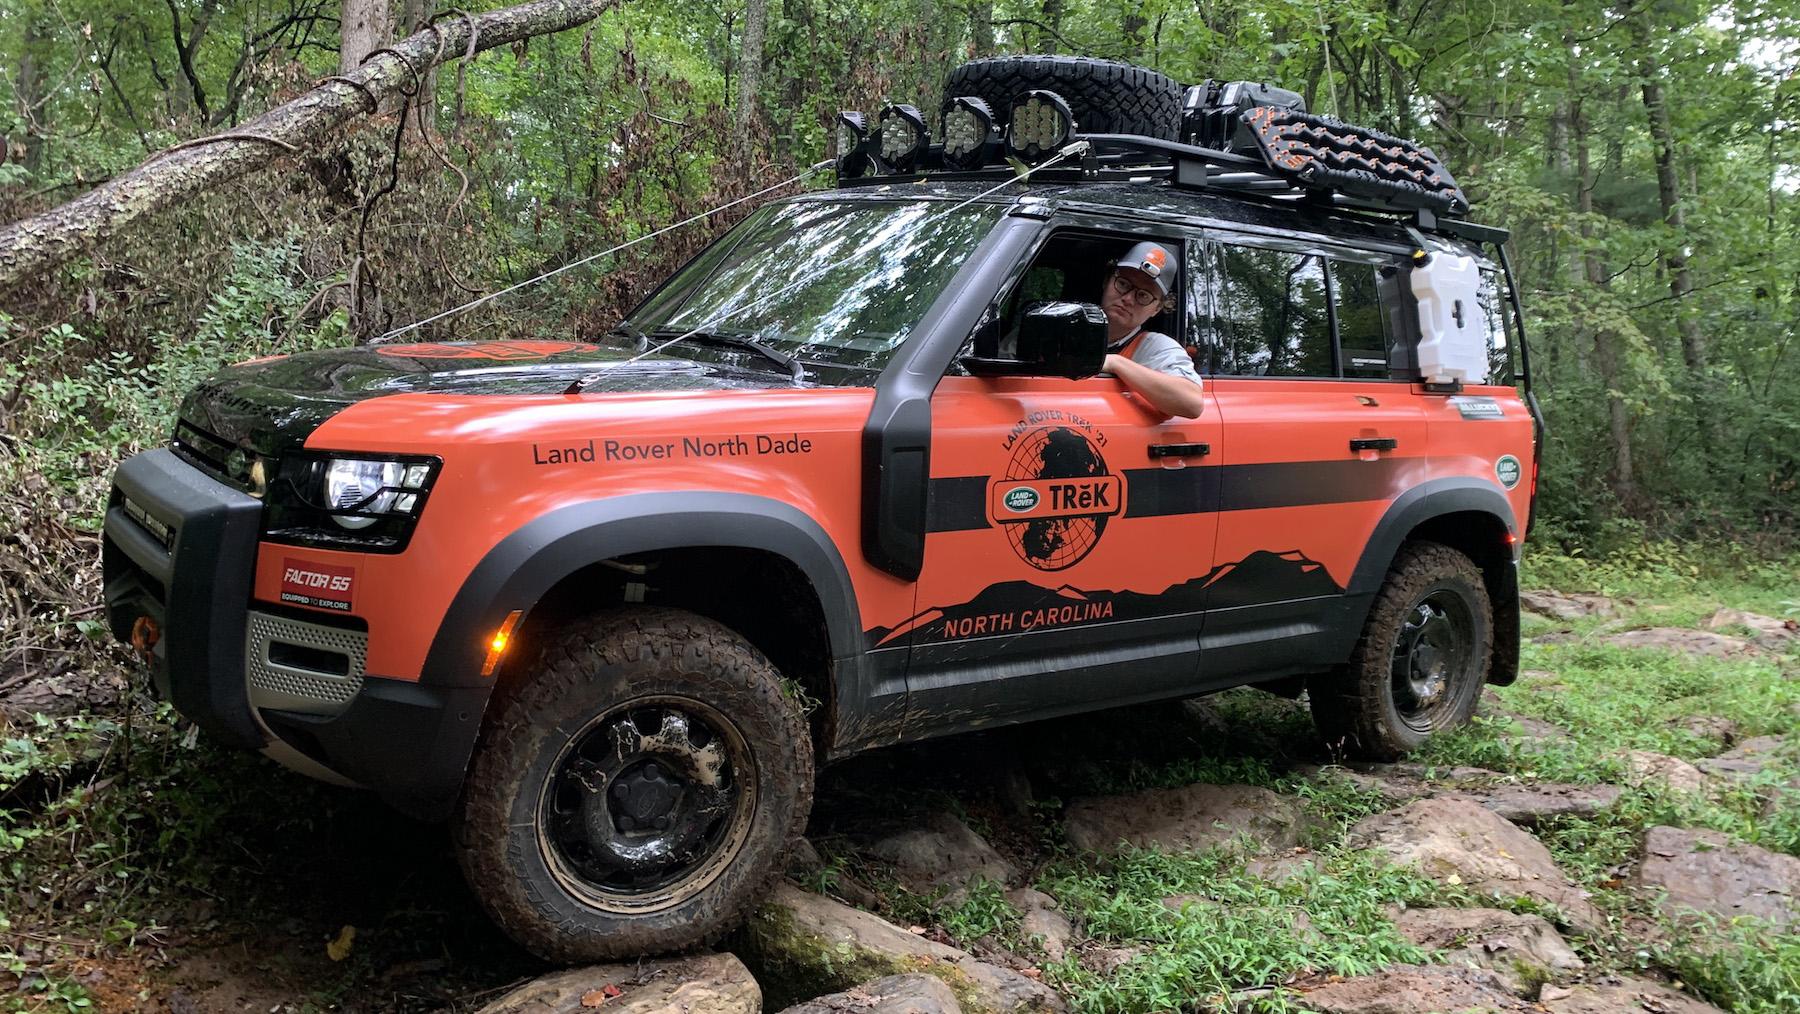 Land Rover Trek